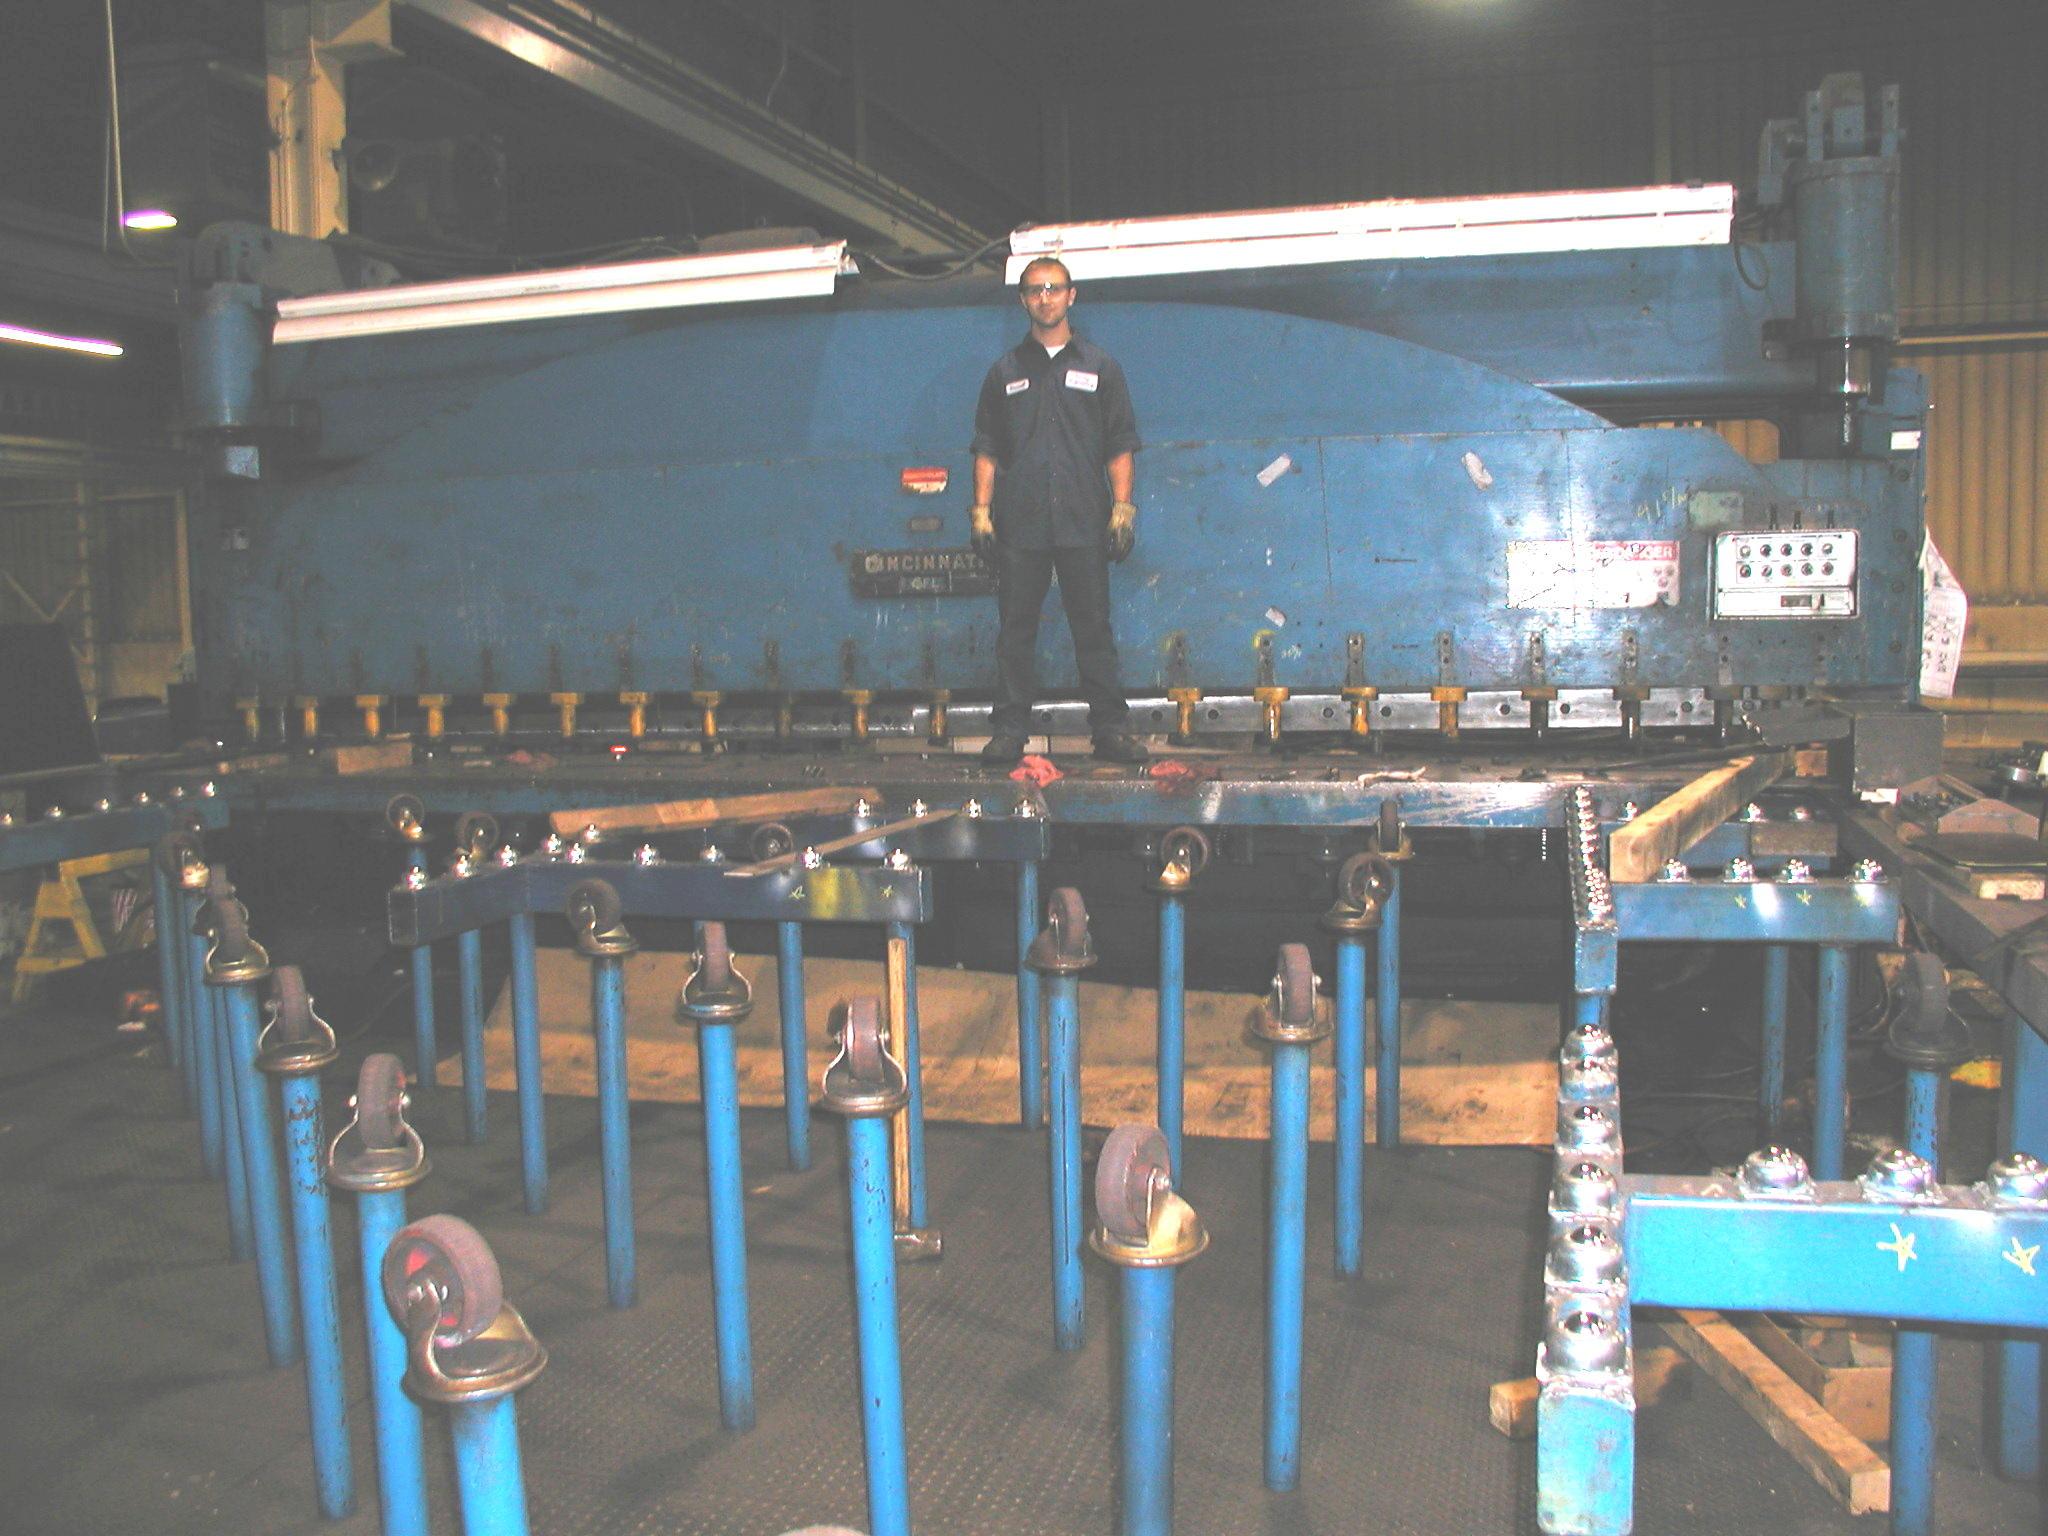 Hydraulic Shear 20 ft x 5/8 inch Capacity